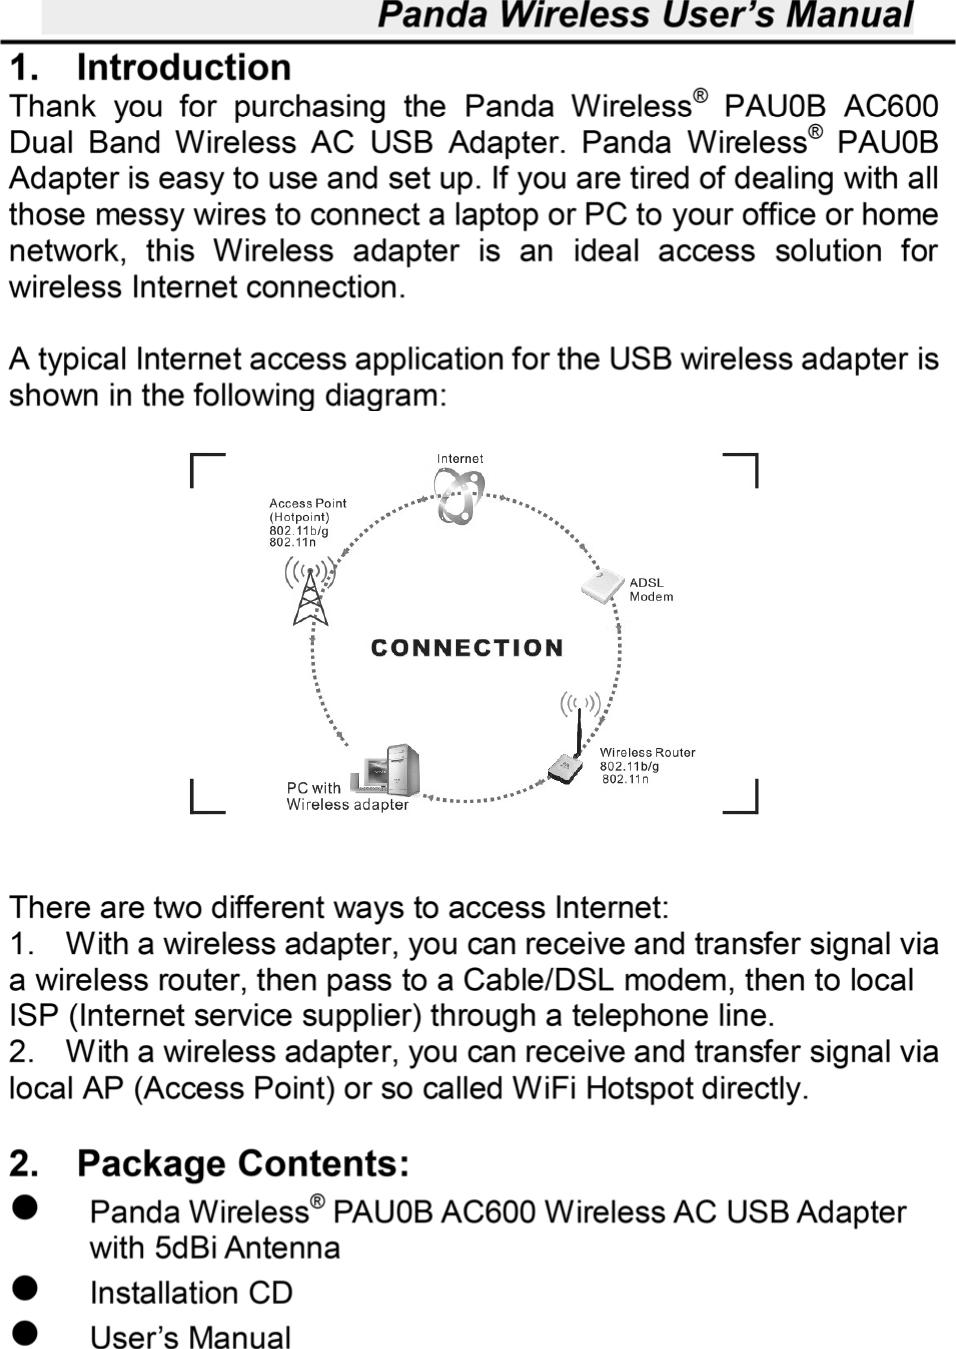 Panda Wireless Lgpau0b Ac600 Dual Band Ac Wifi Antenna Wiring Diagram Usb Adapter With 5dbi User Manual 6 1